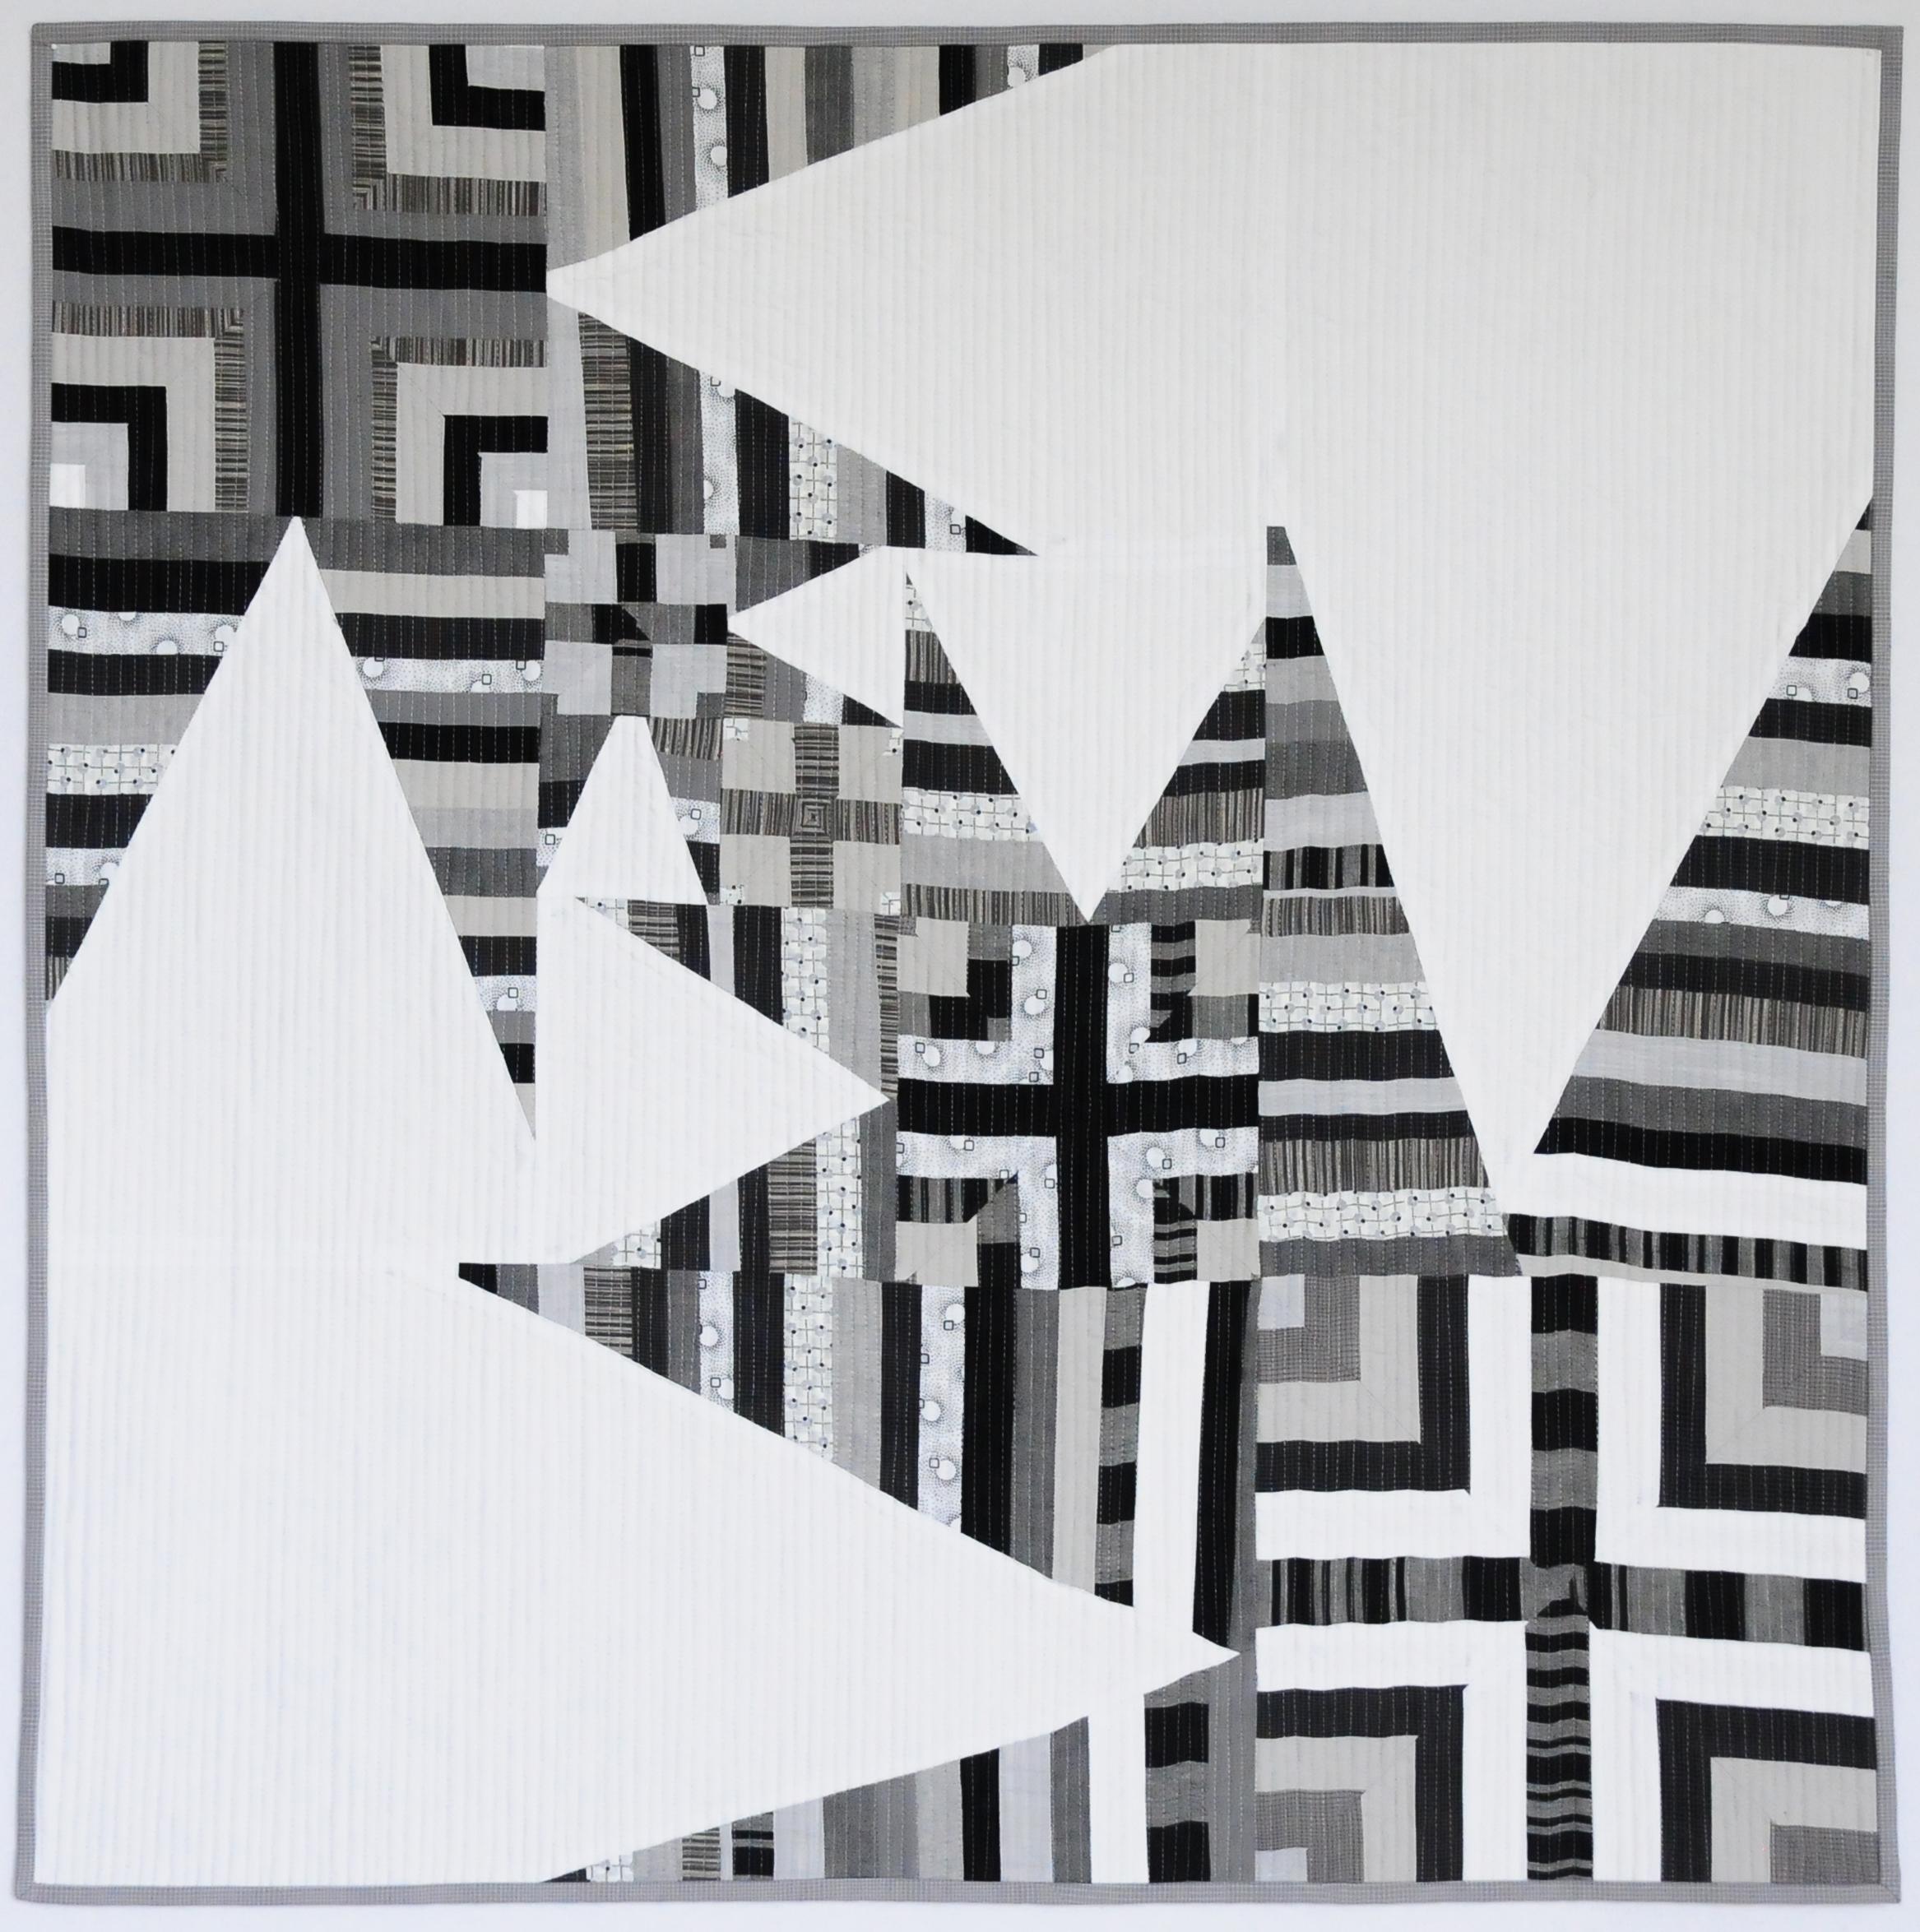 Nested Star-Crossed Strings, 2017, 31x31